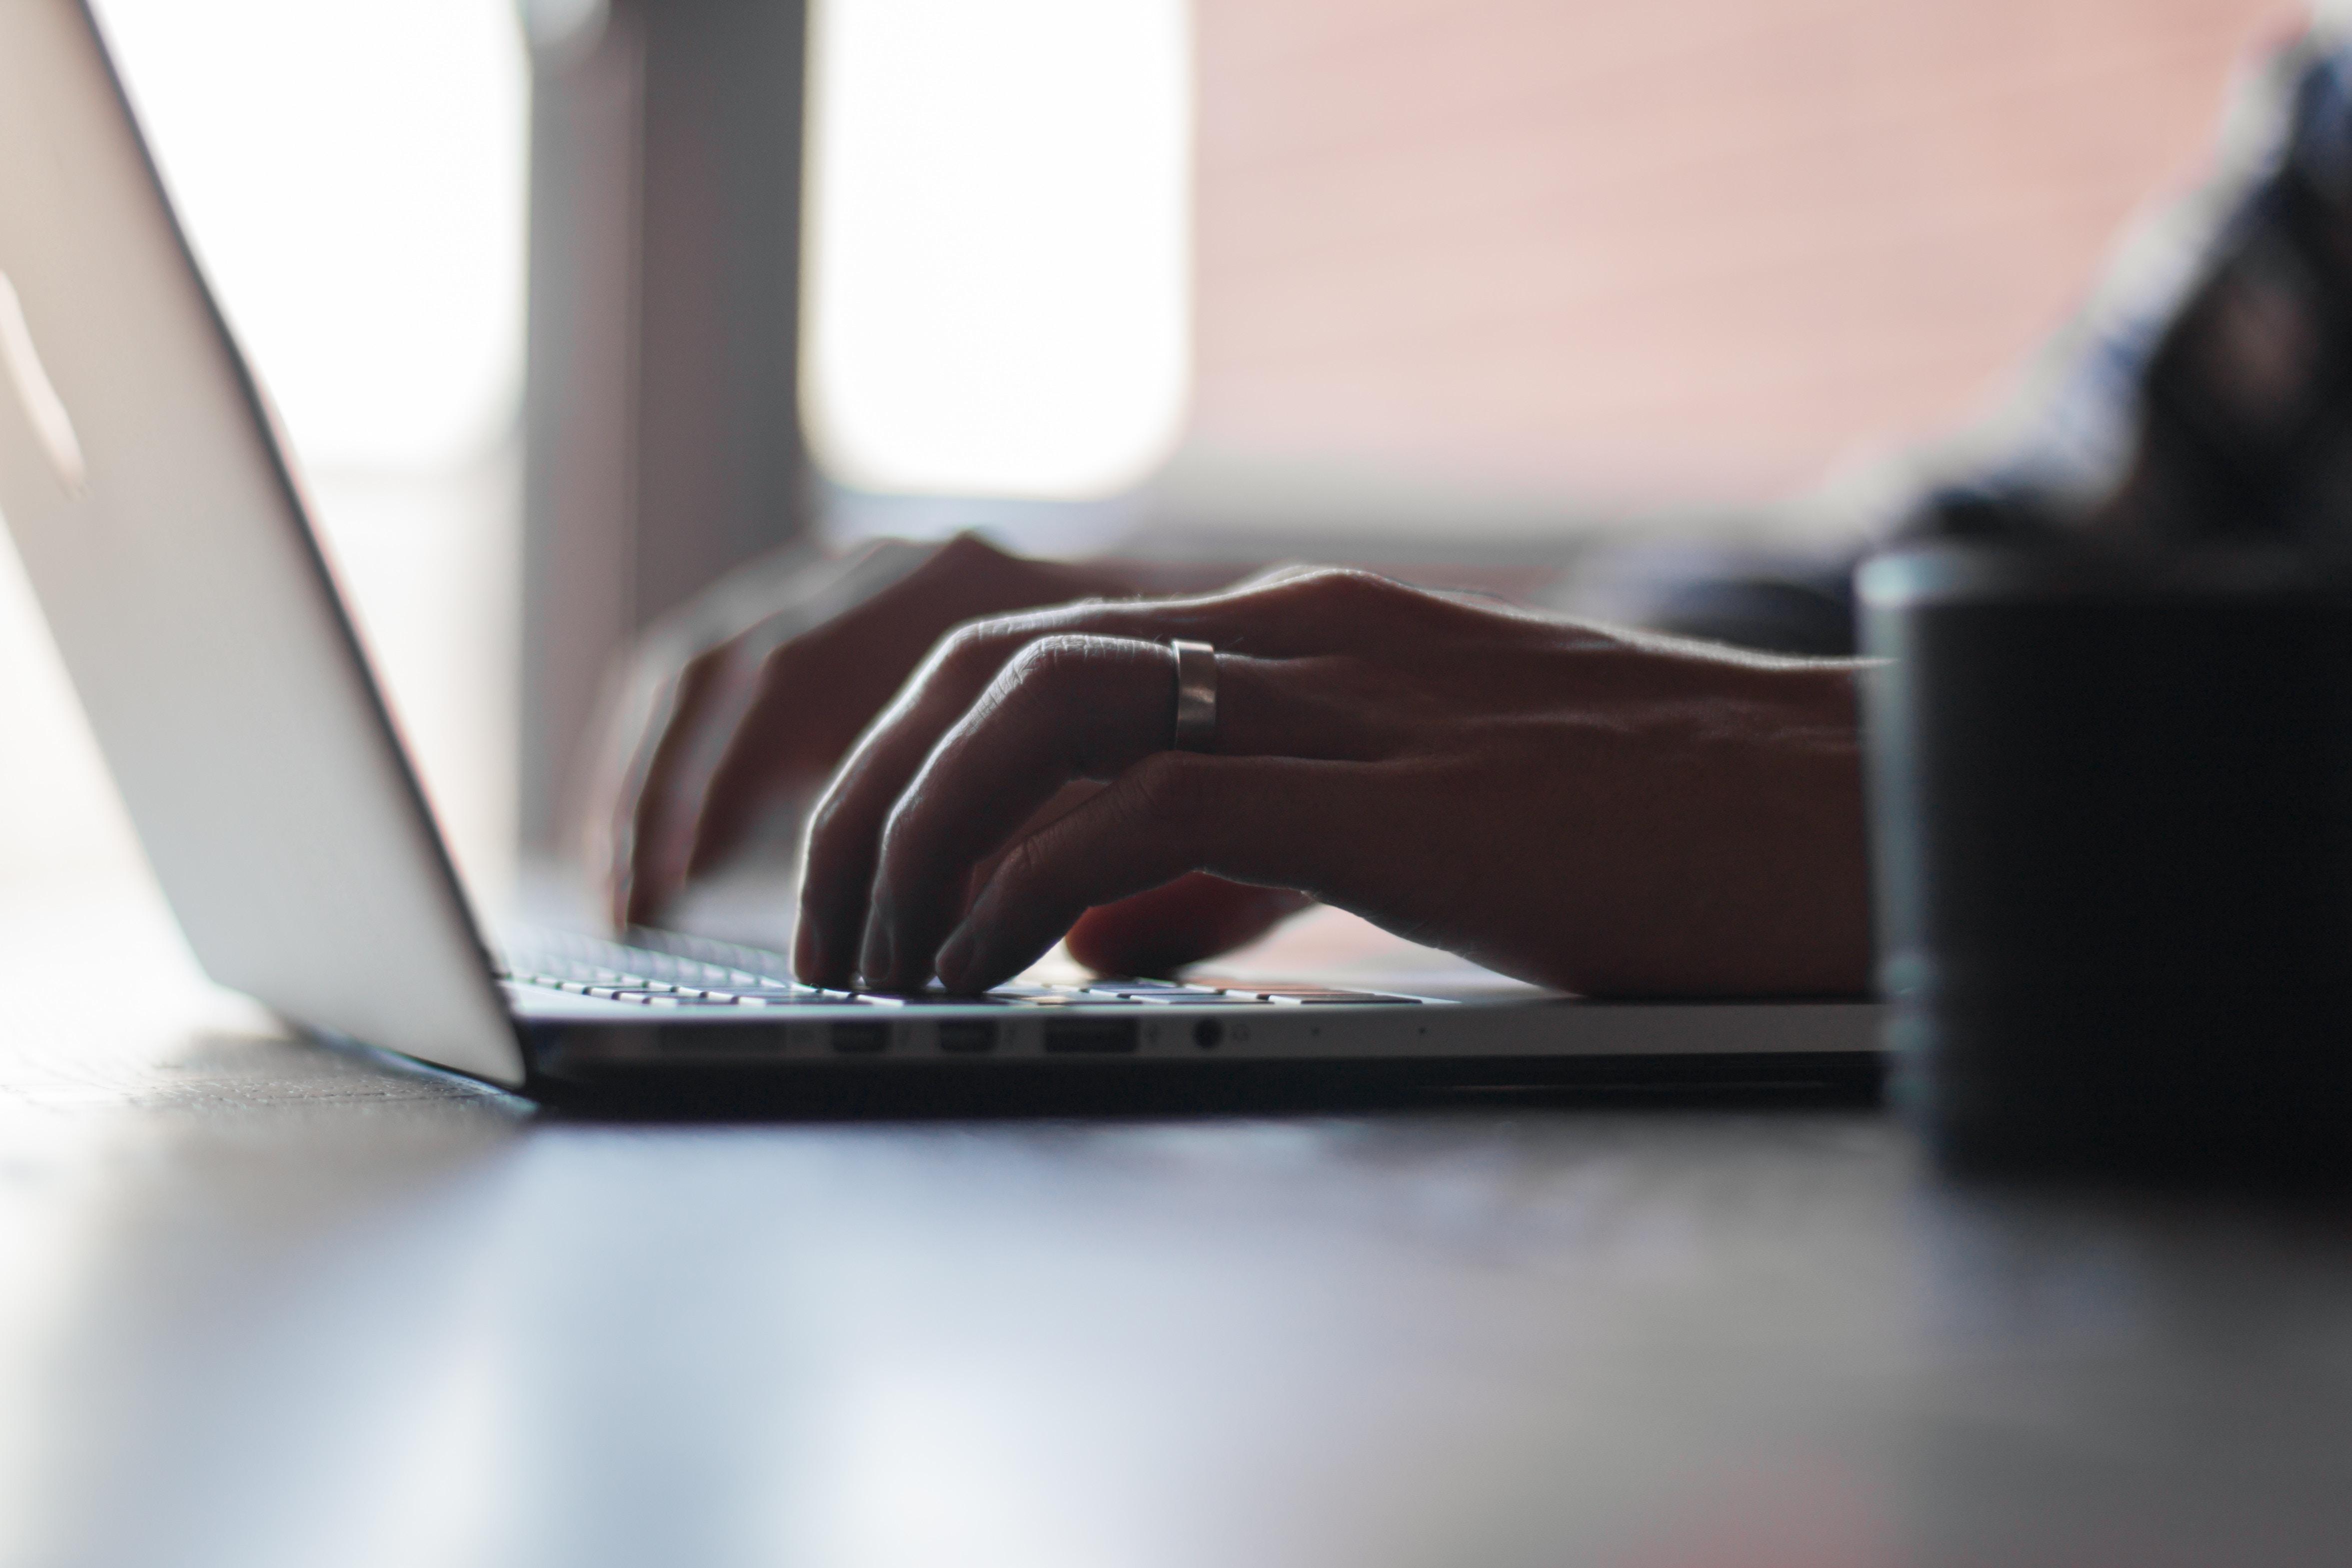 cybersecurity trends - cybersecurity market - typing.jpg